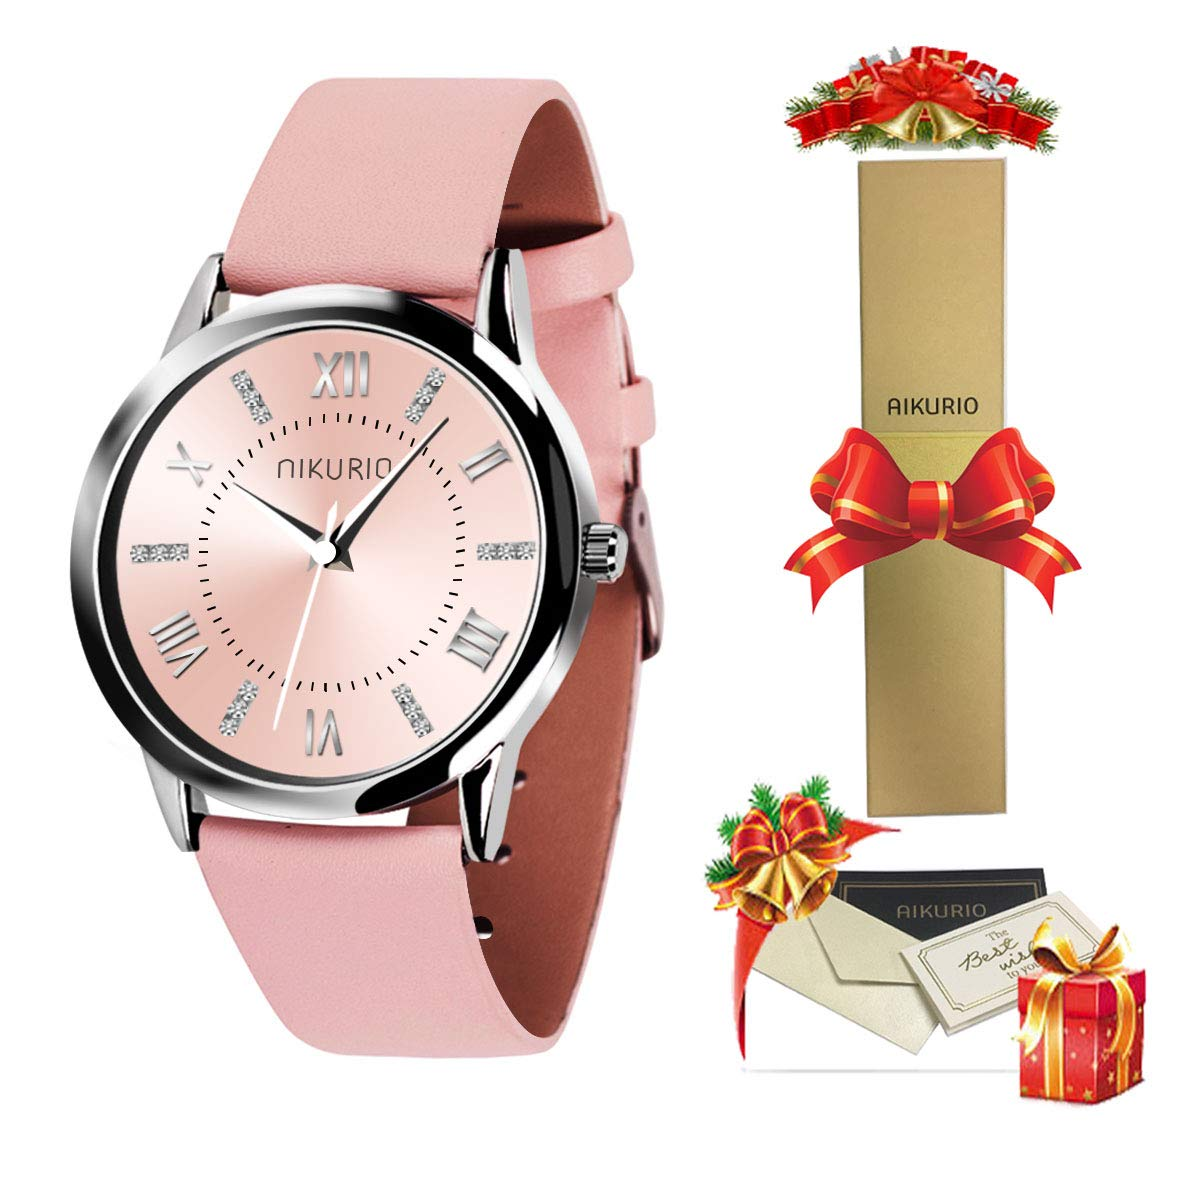 40% OFF AIKURIO Damen Armbanduhr Analog Quarz 30M Wasserdicht mit Lederband Crystal Dial